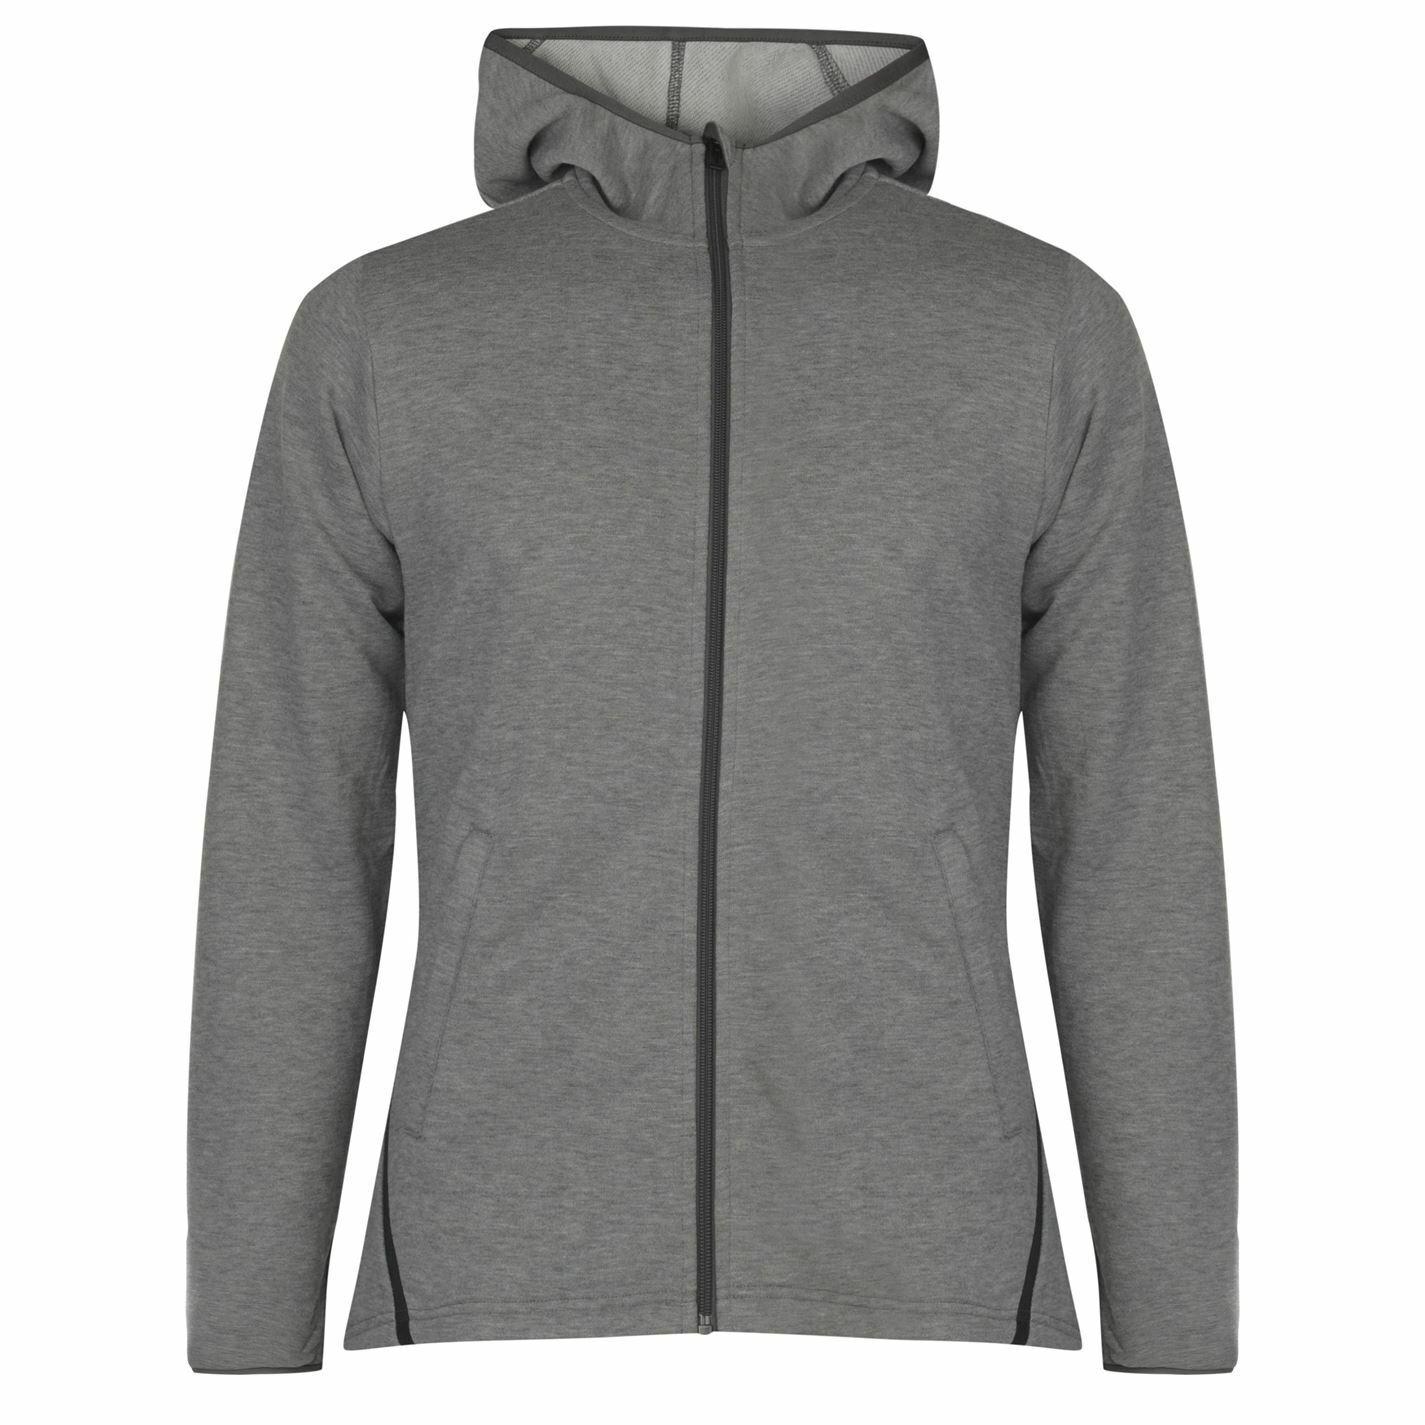 Adidas Zipped Sport Activity Hoody Mens Gents Performance Hoodie Hooded Top High